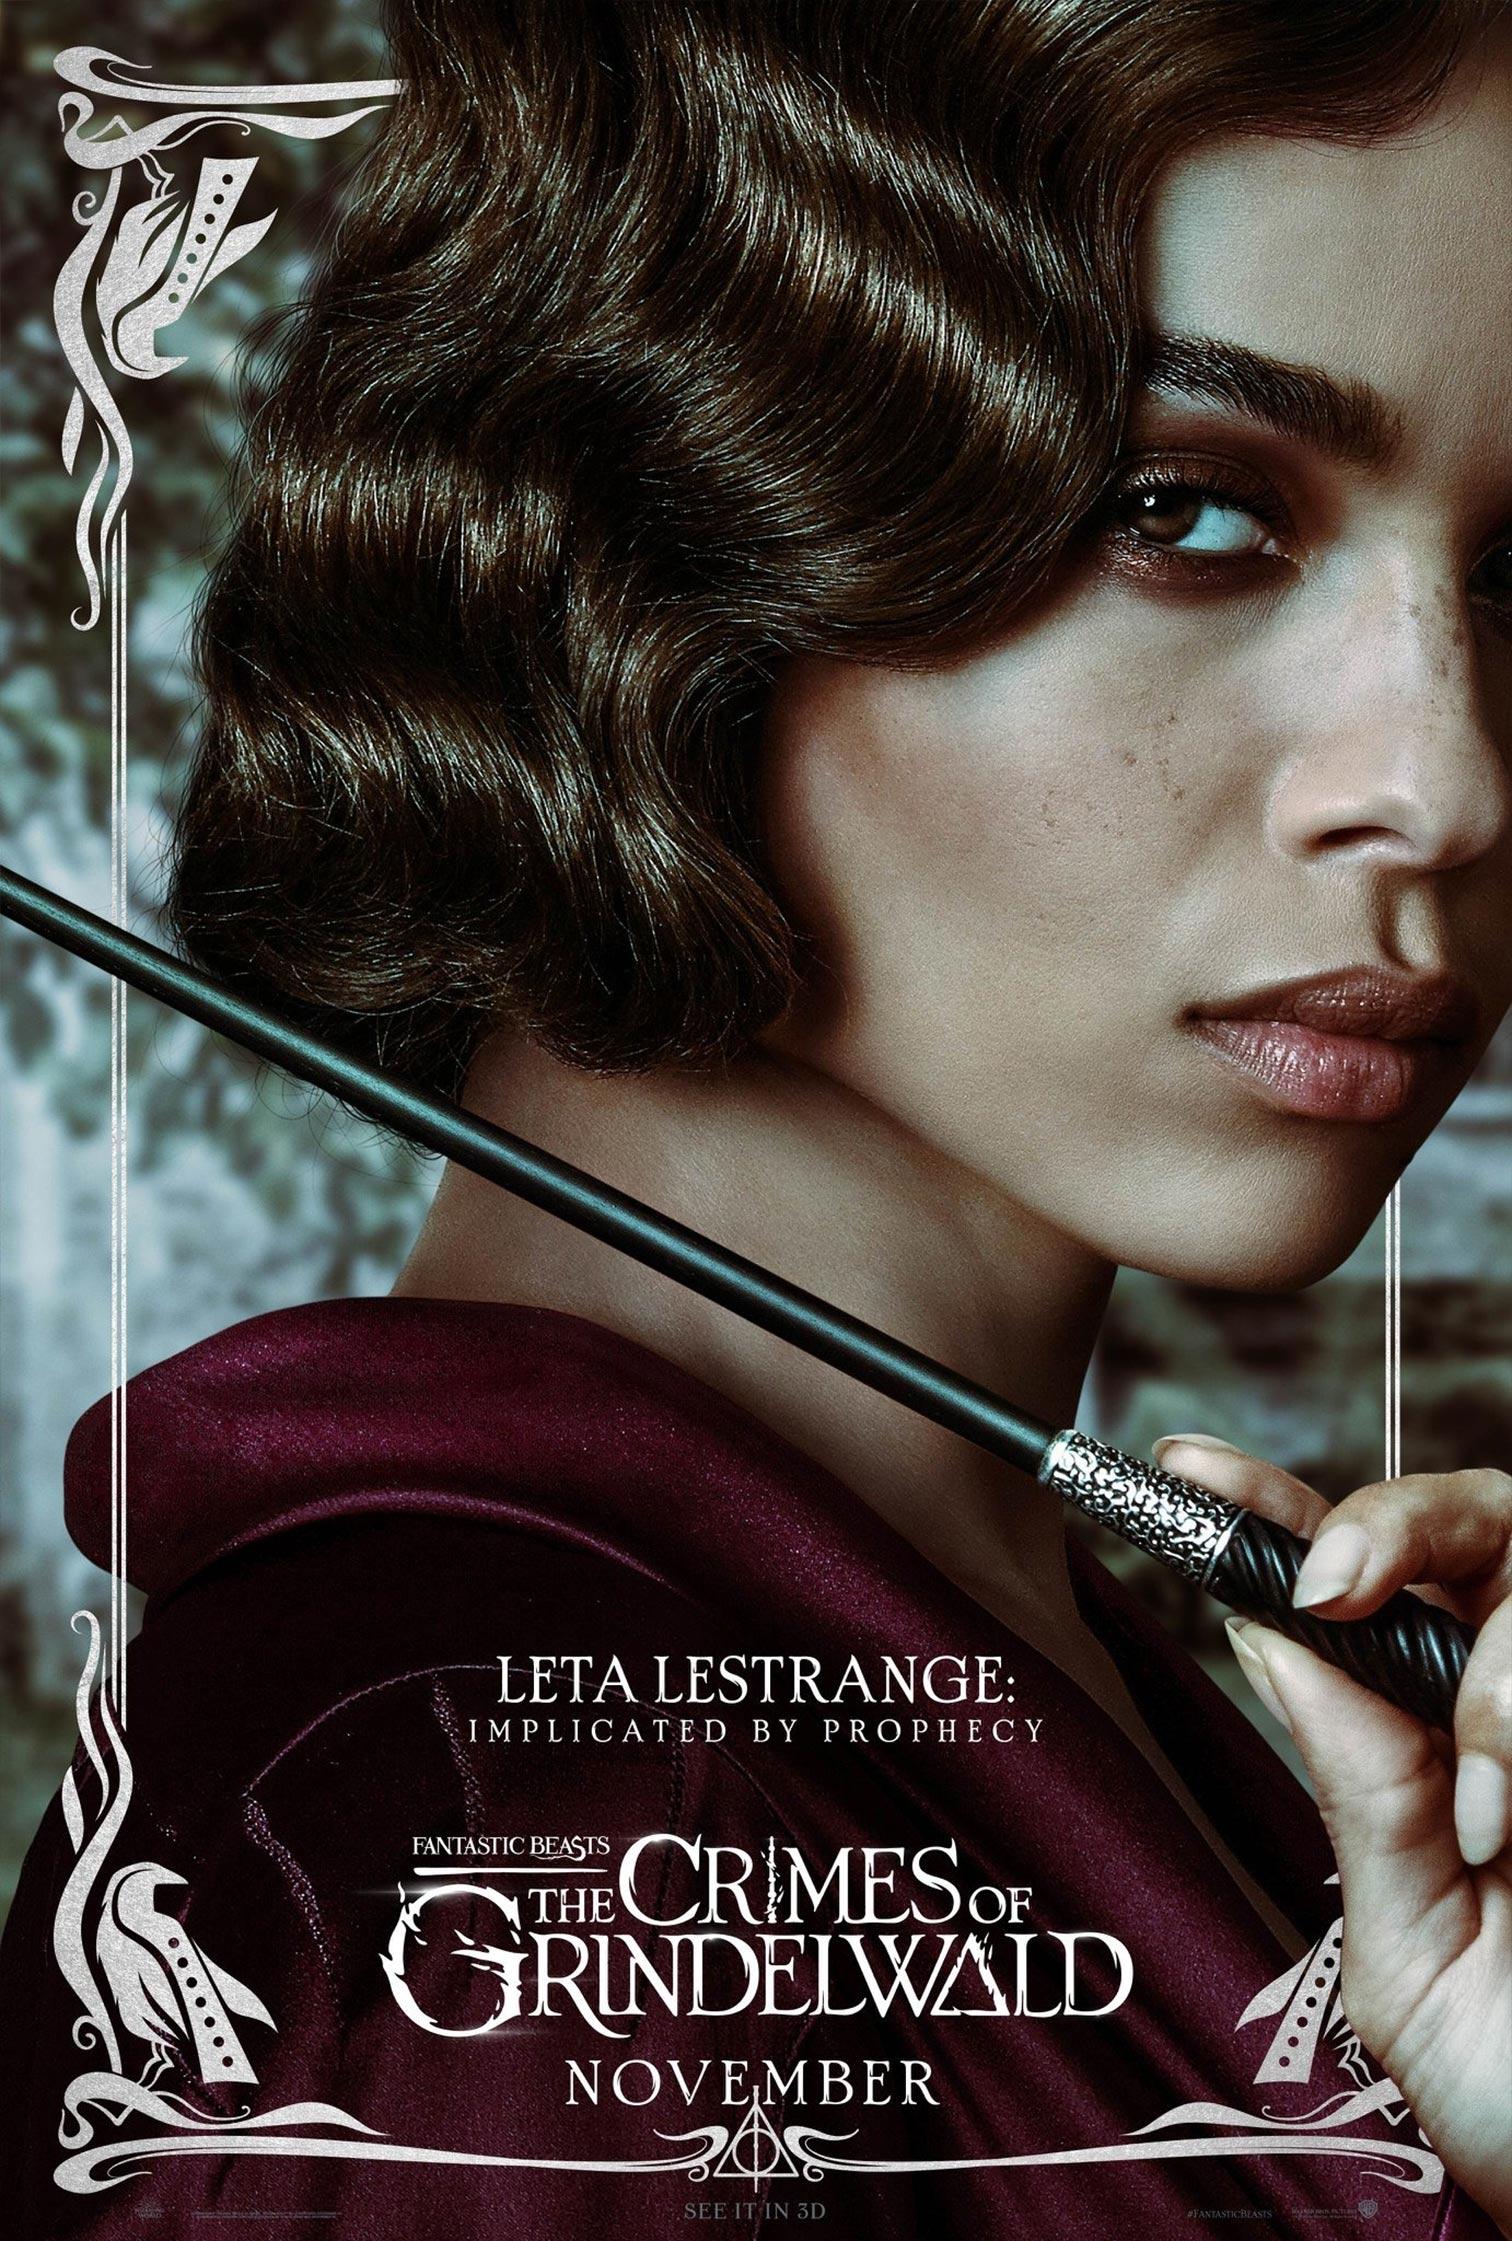 Fantastic Beasts: The Crimes of Grindelwald Poster #9